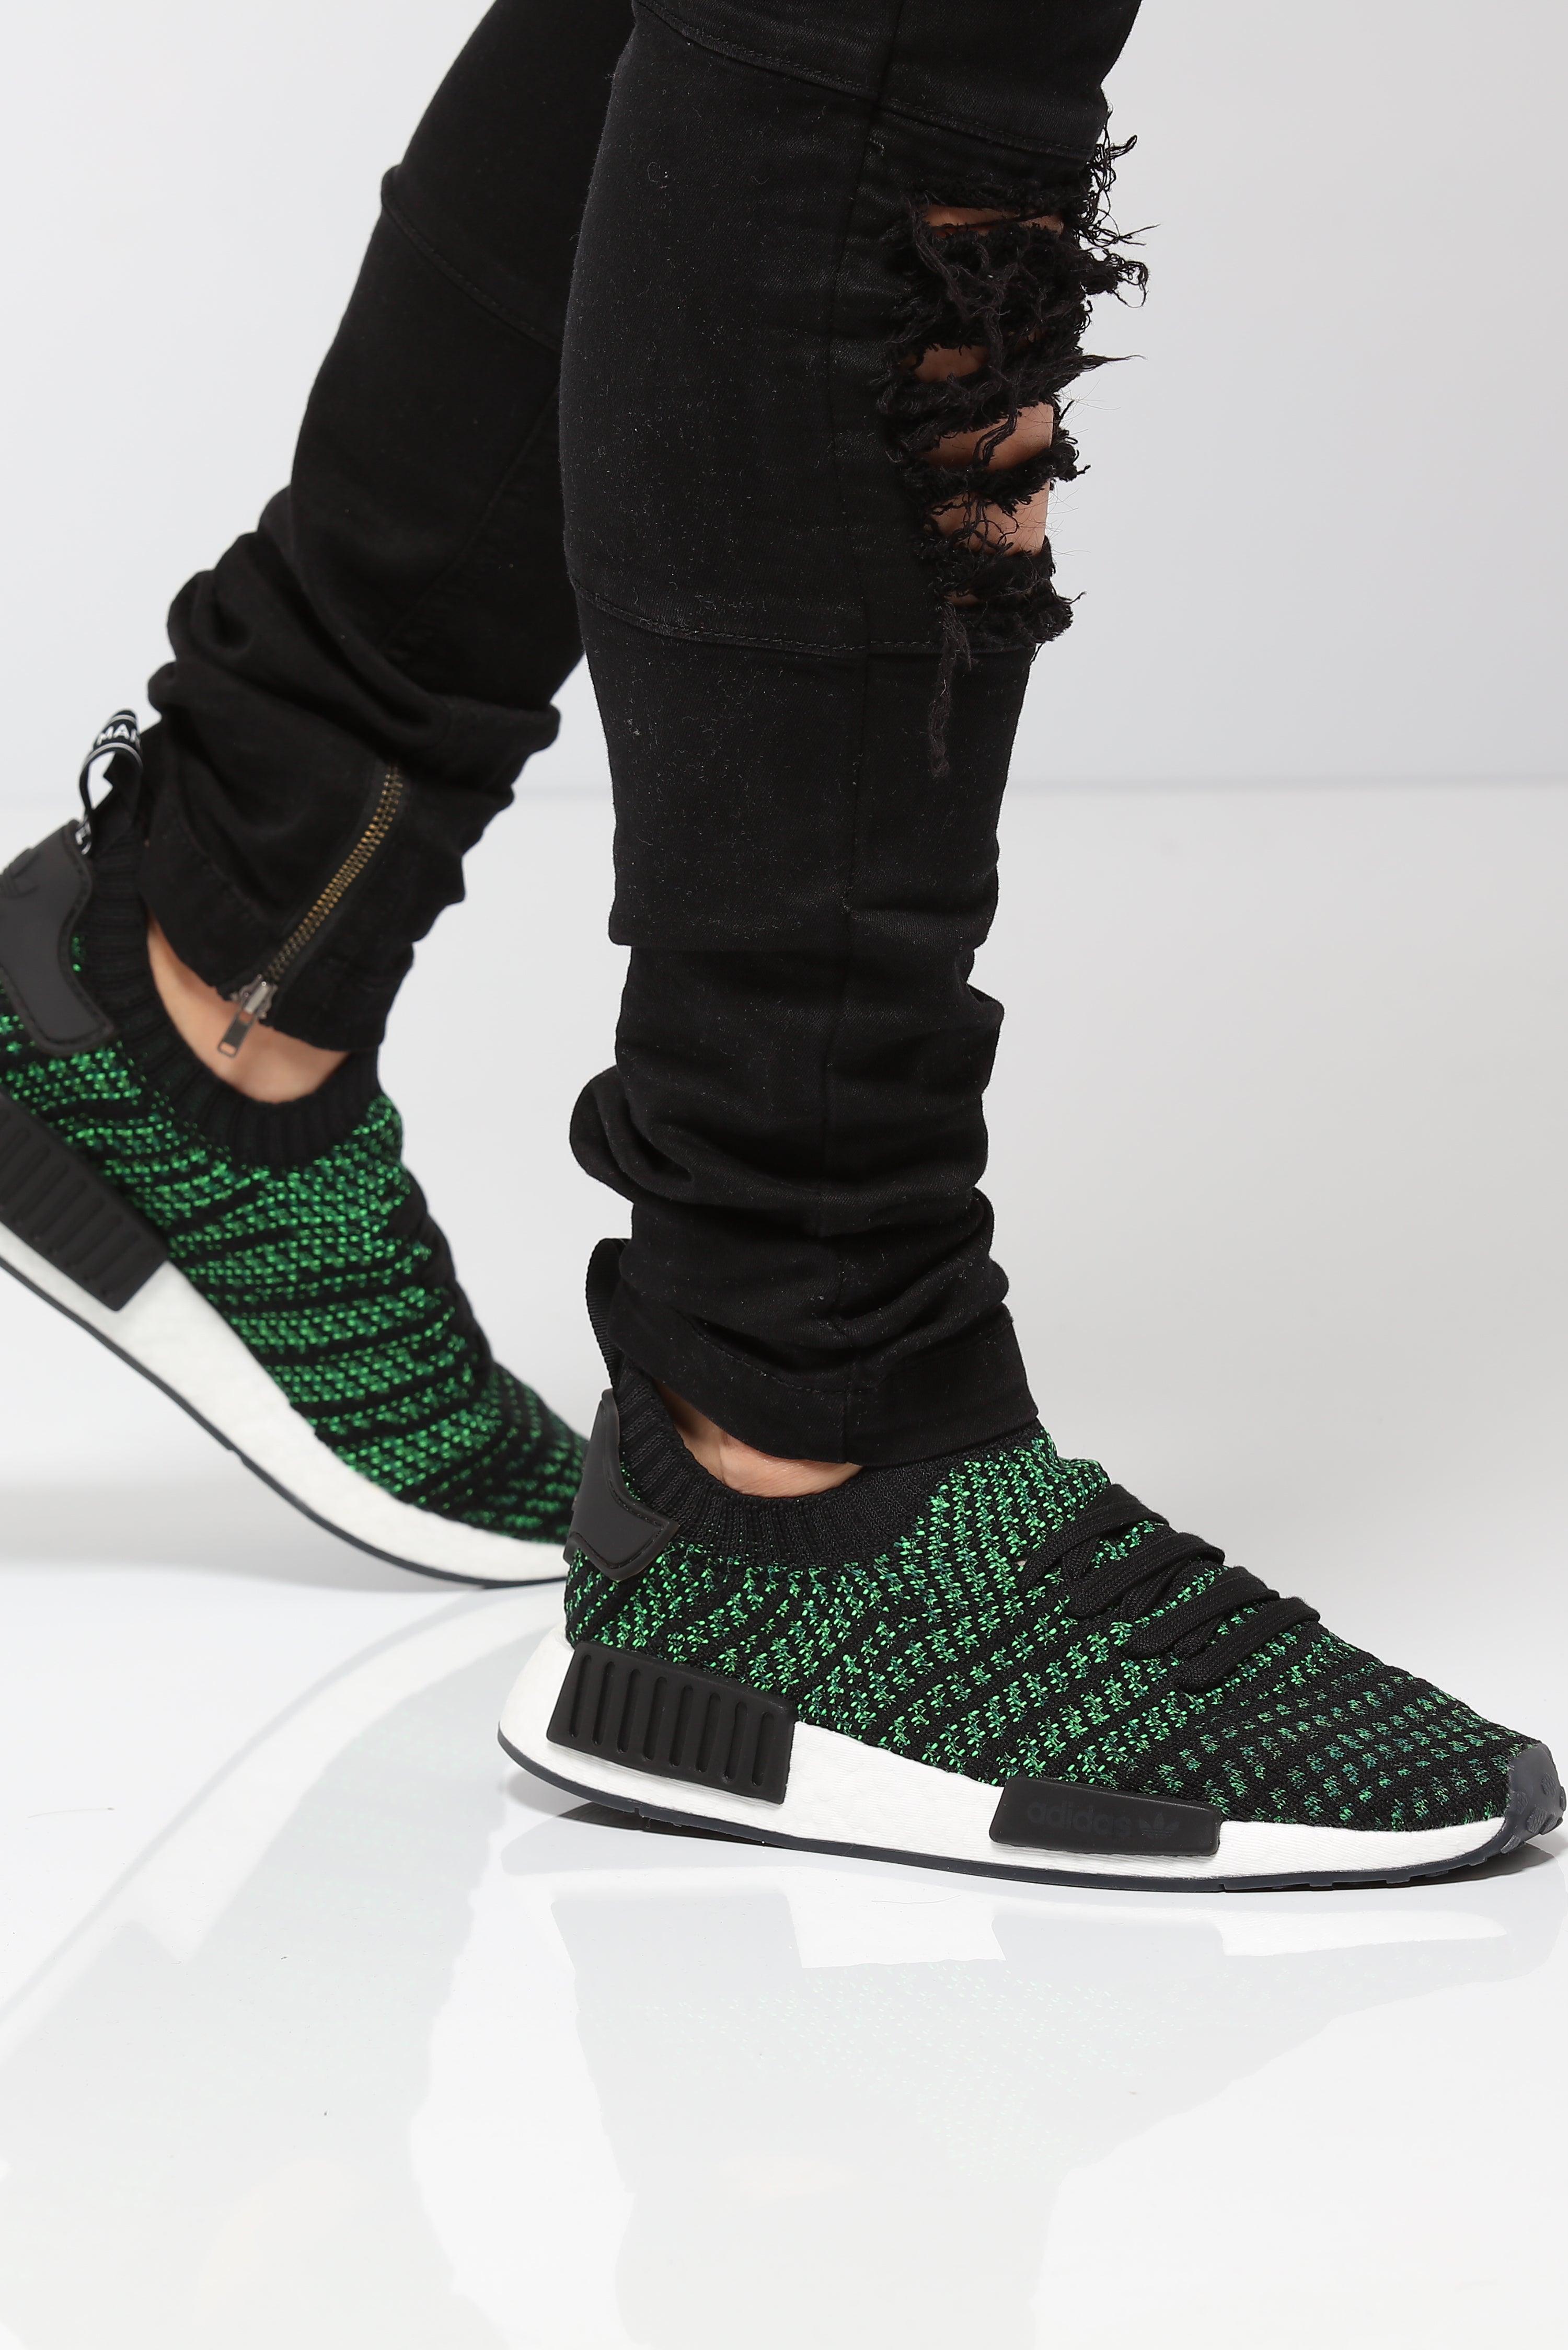 Adidas NMD R1 STLT Primeknit Green